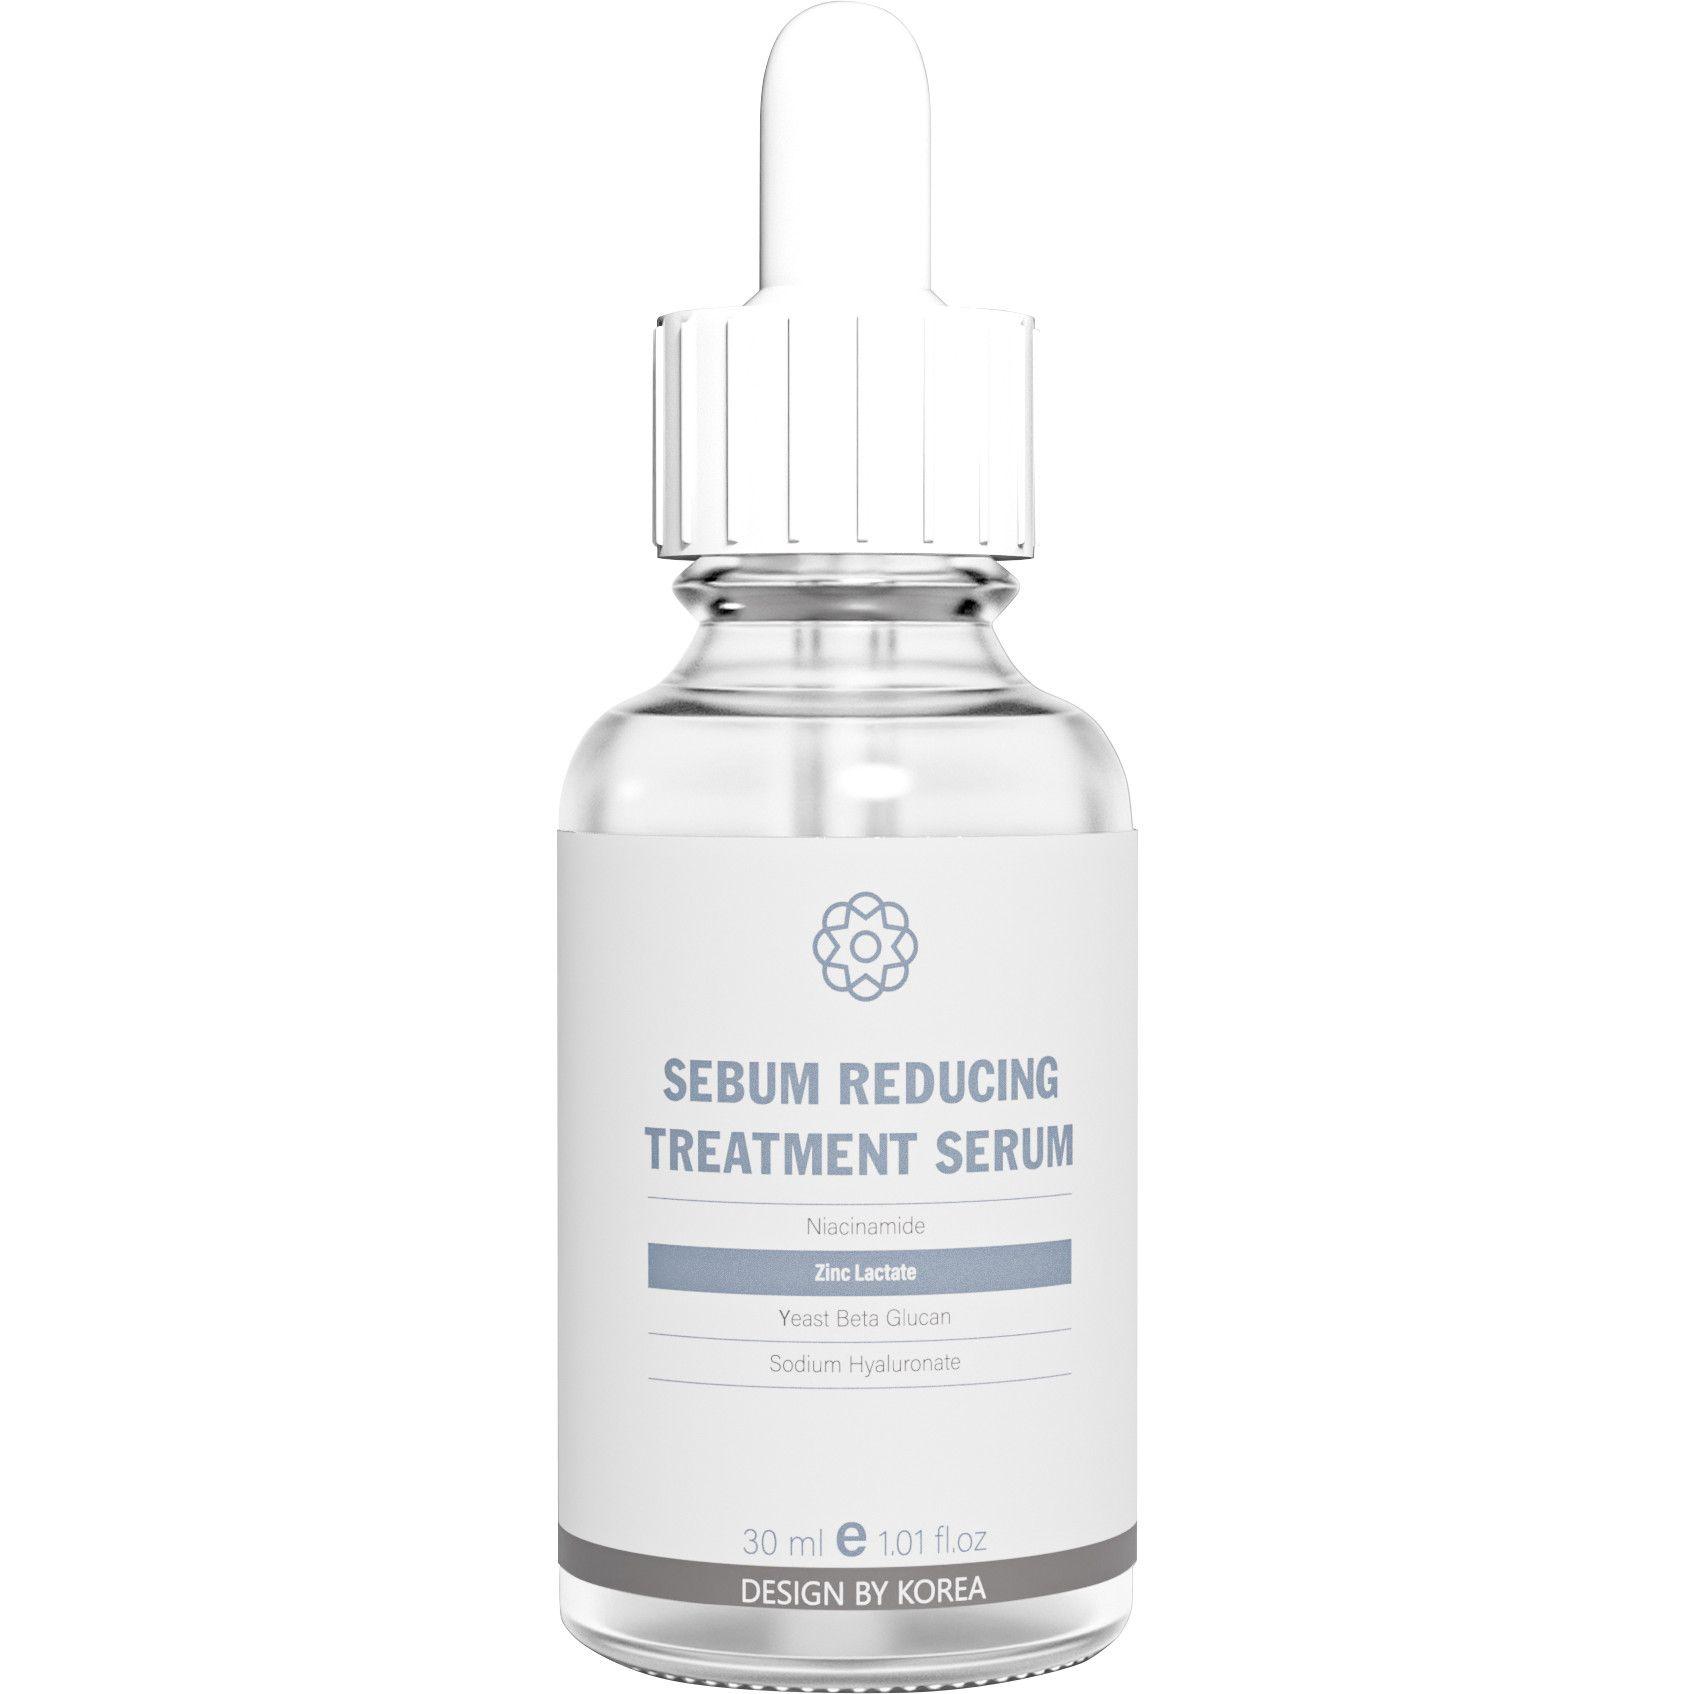 tinh-chat-duong-da-hathor-beauty-sebum-reducing-treatment-serum-review-thanh-phan-gia-cong-dung